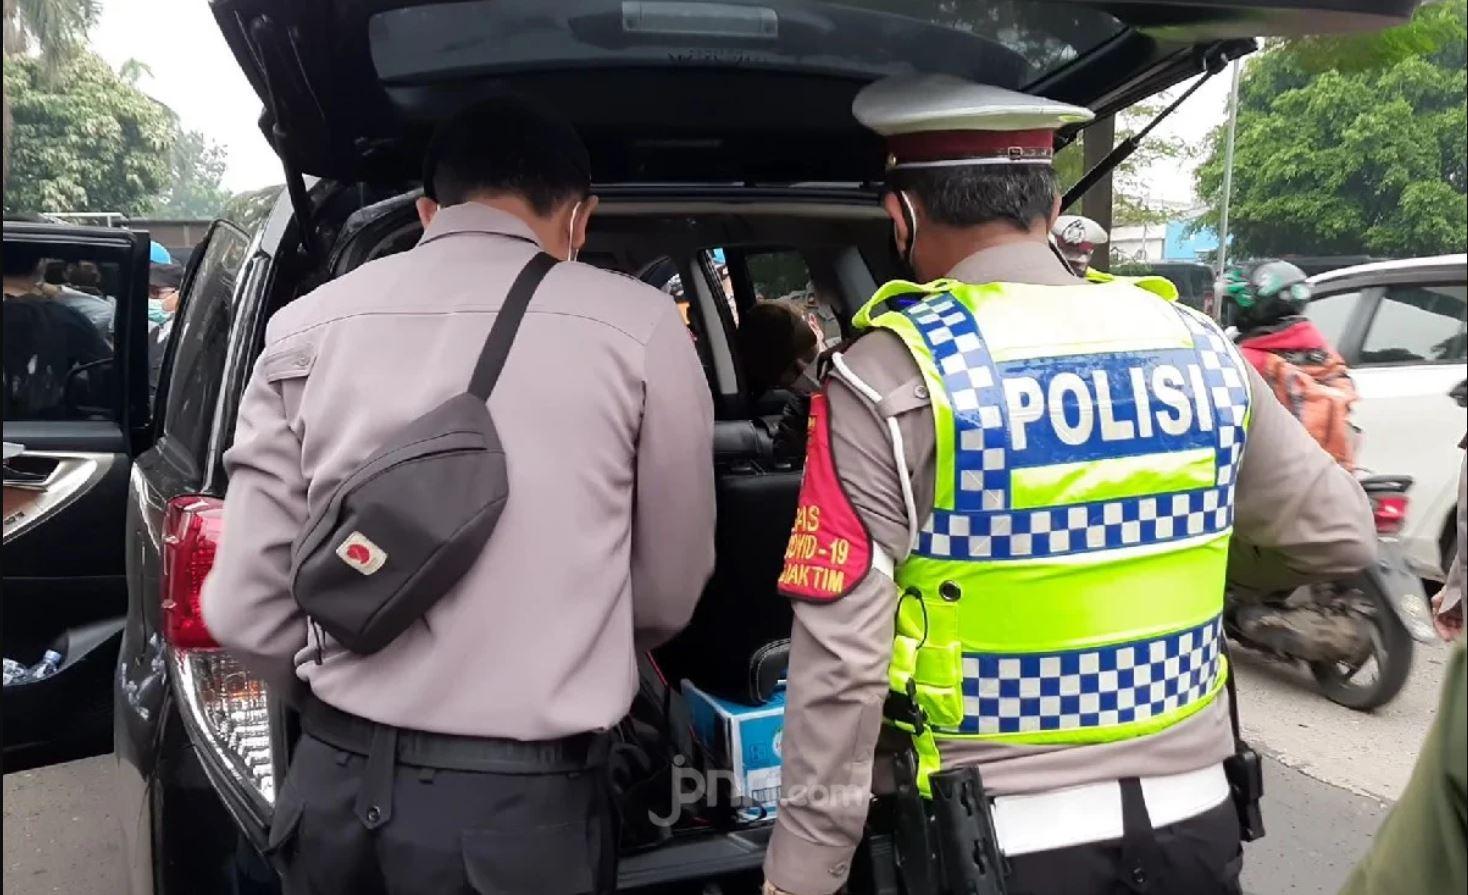 Petugas kepolisian saat memeriksa mobil yang diduga milik simpatisan di depan Pengadilan Negeri Jakarta Timur, Kamis (24/6) (Foto : Kenny Kurnia Putra/JPNN.com)